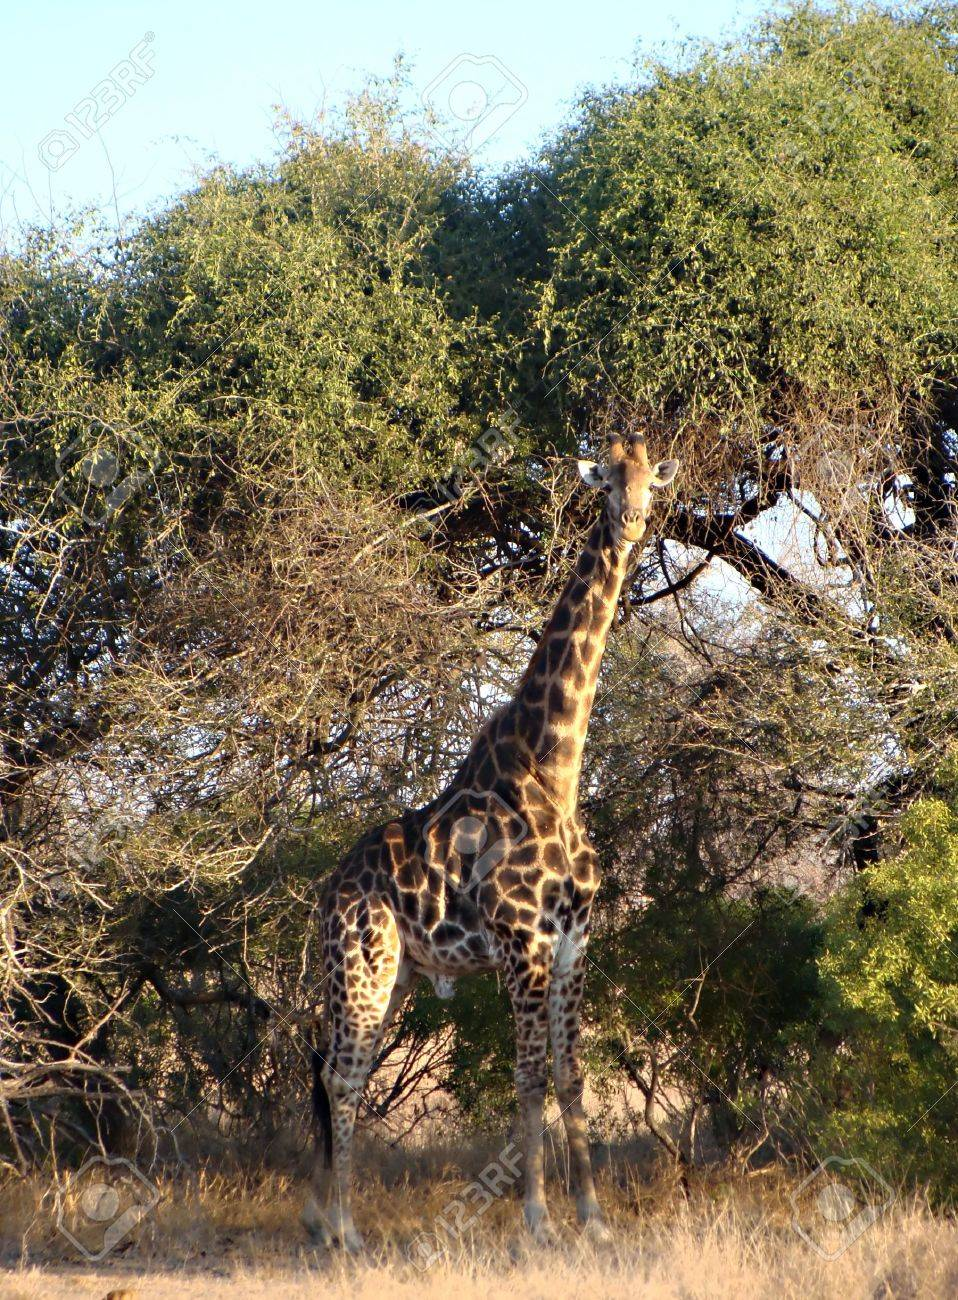 Giraffe in Kruger National Park South Africa Stock Photo - 5381454